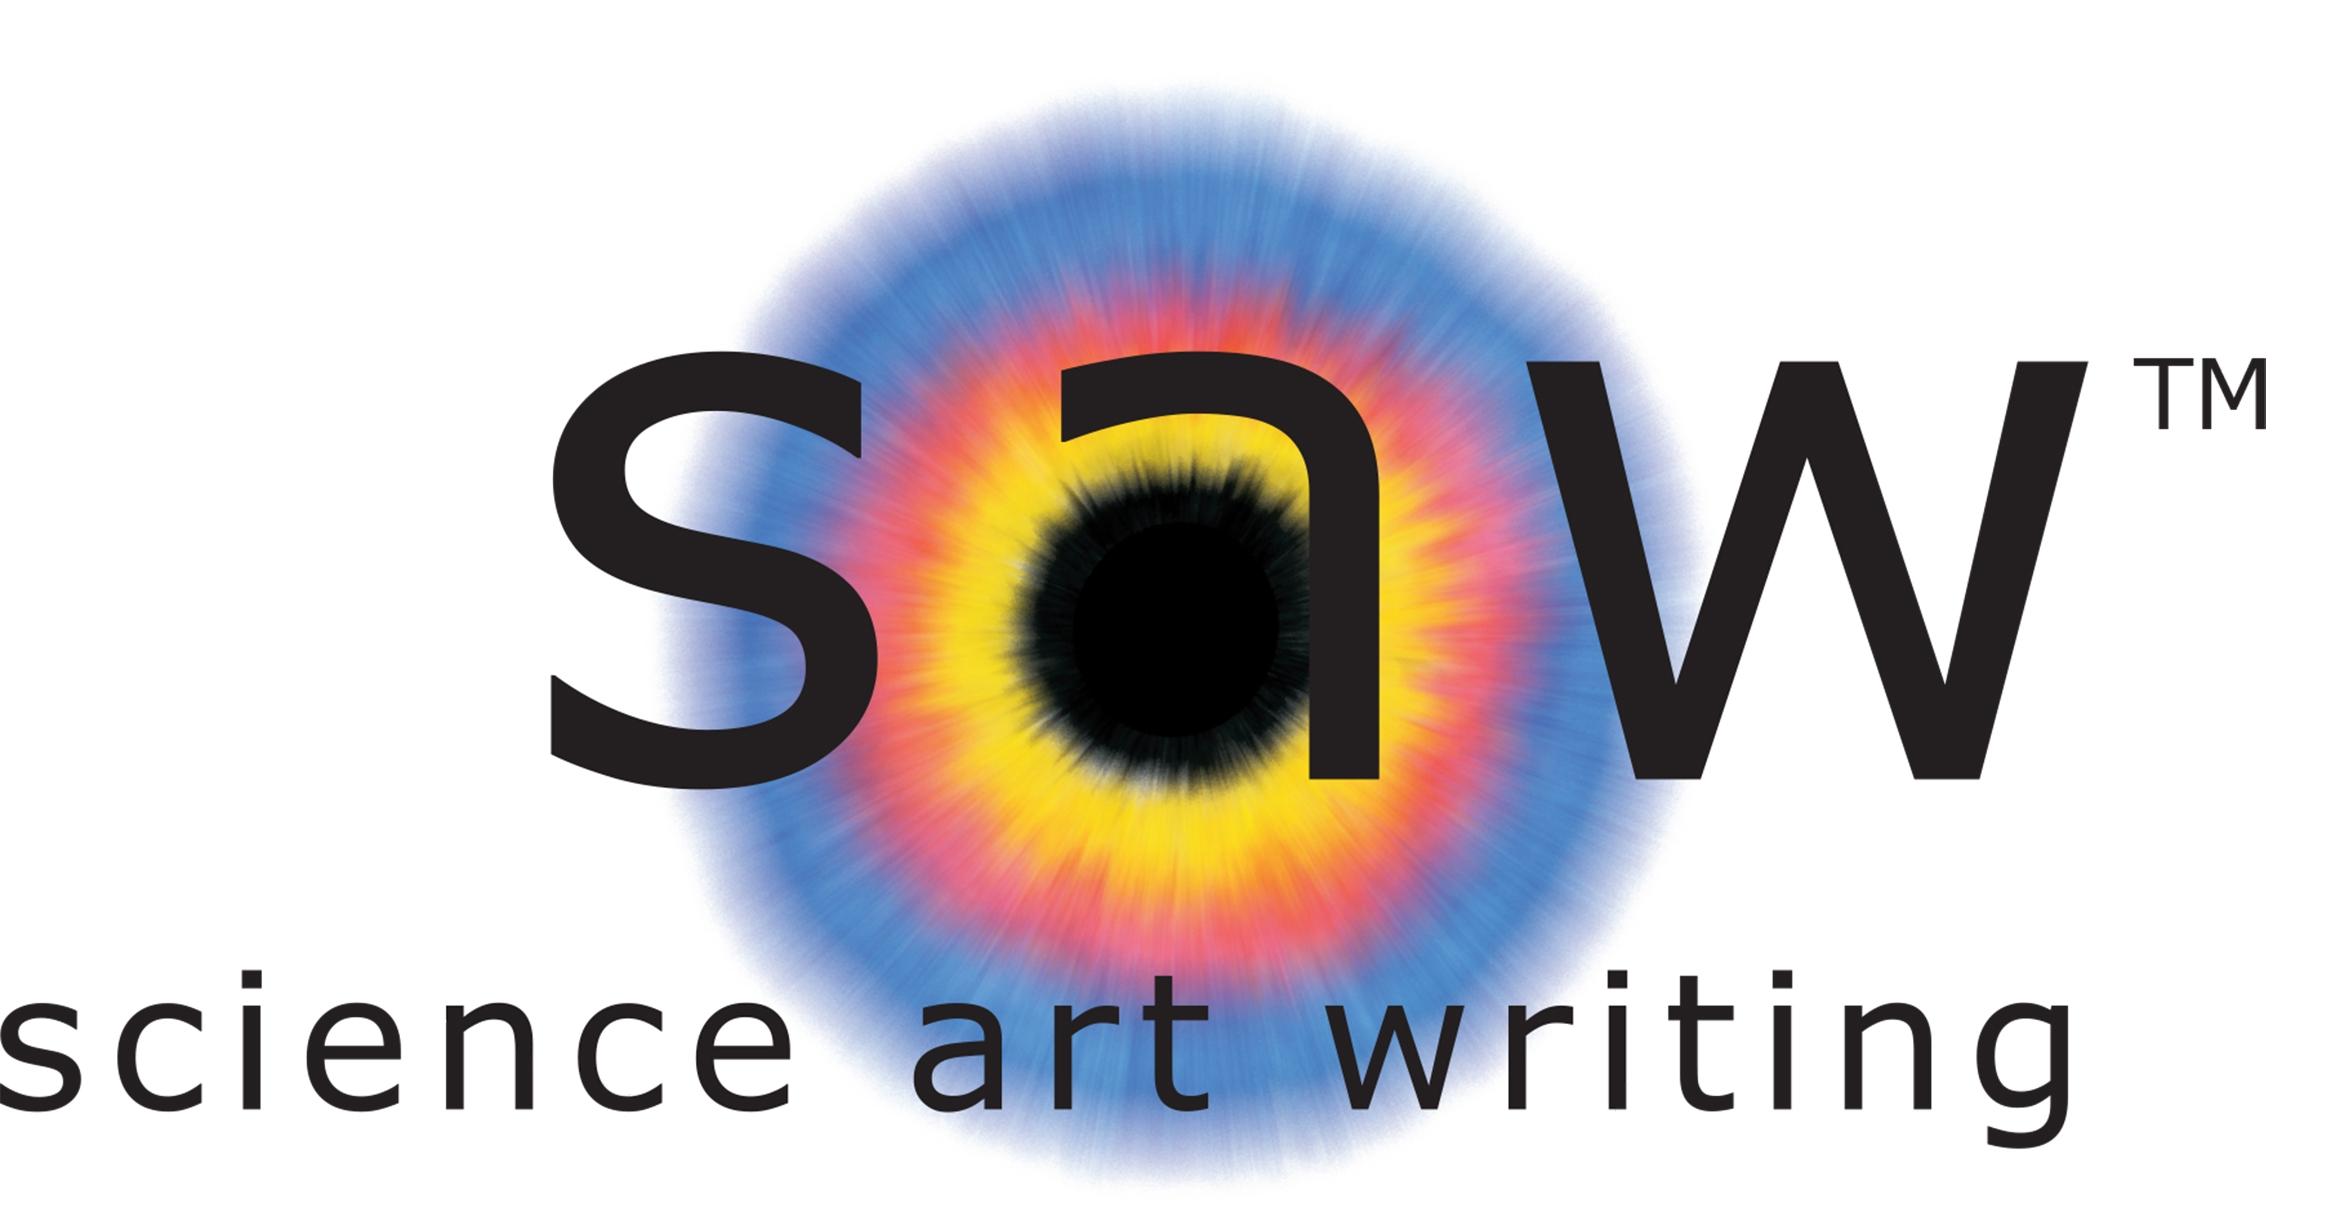 saw logo_TM